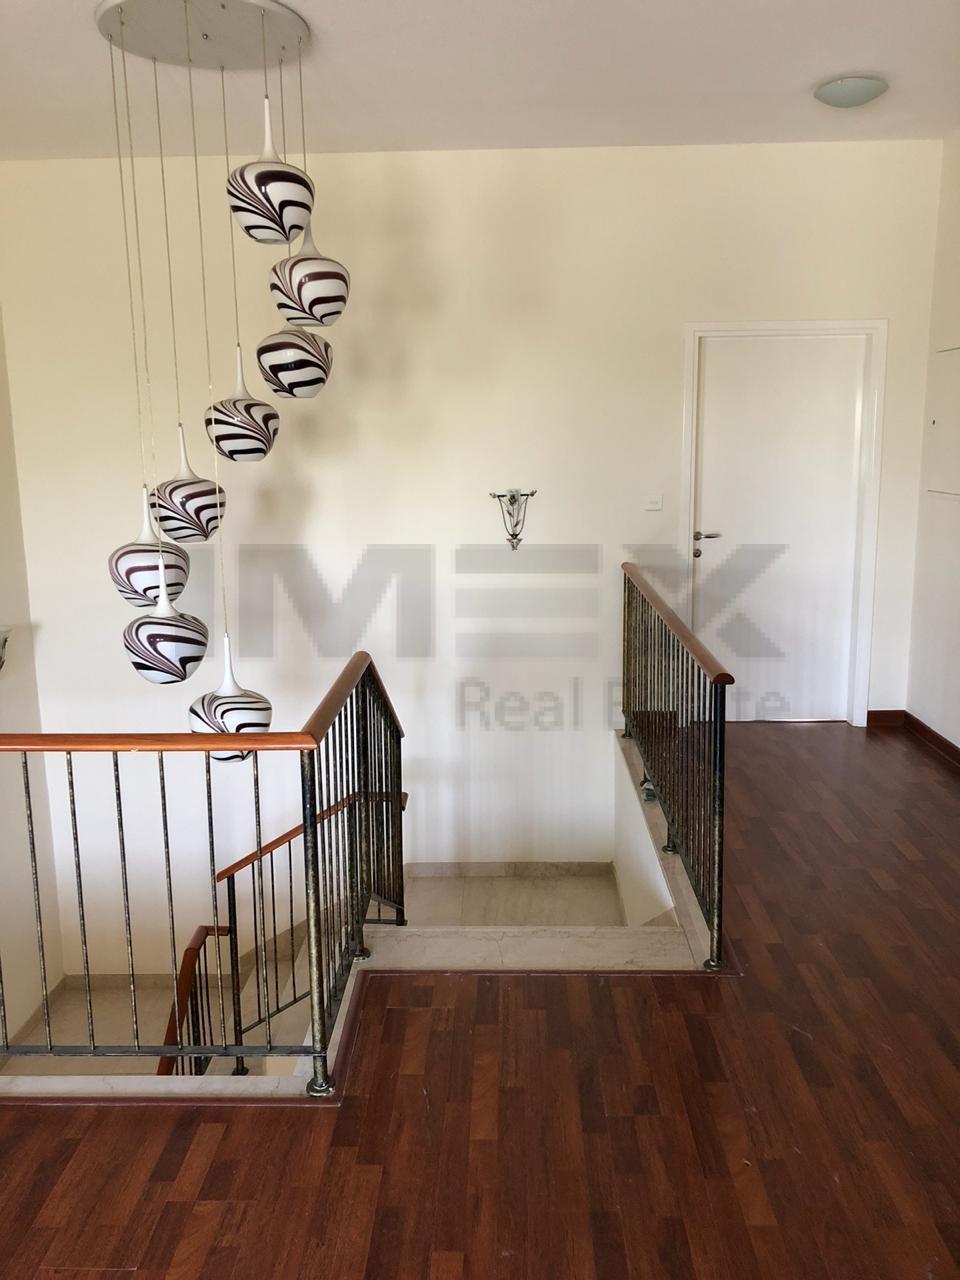 6bedroomsmaid-room-type-9-upgraded-villa-for-sale